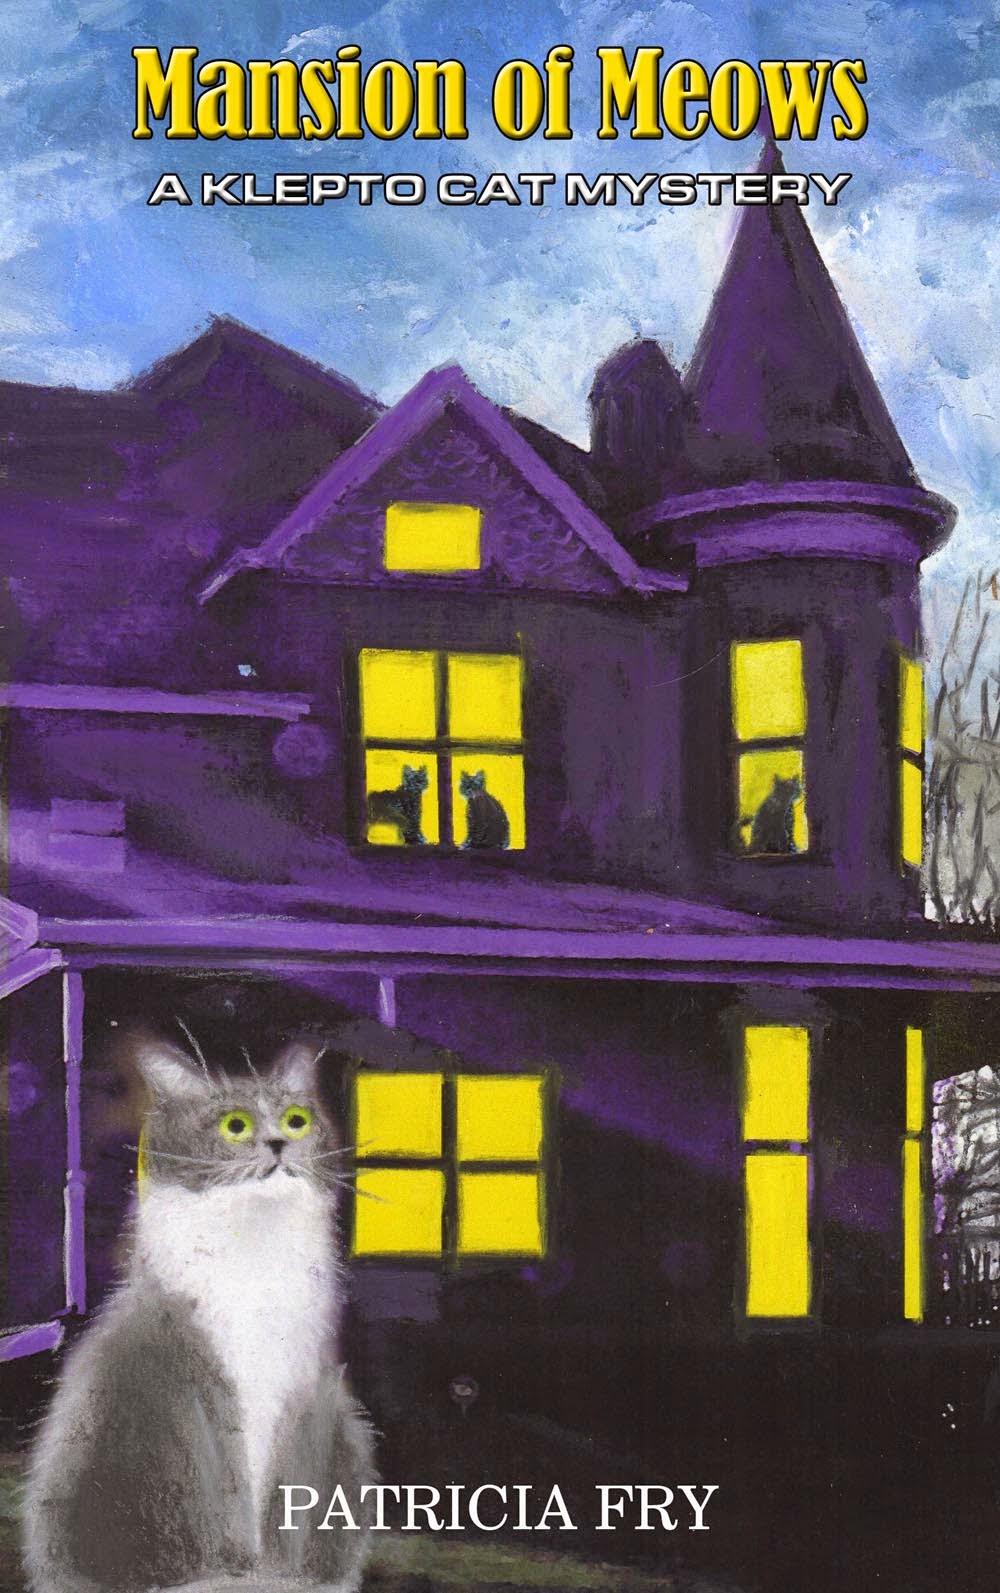 Klepto Cat Mysteries